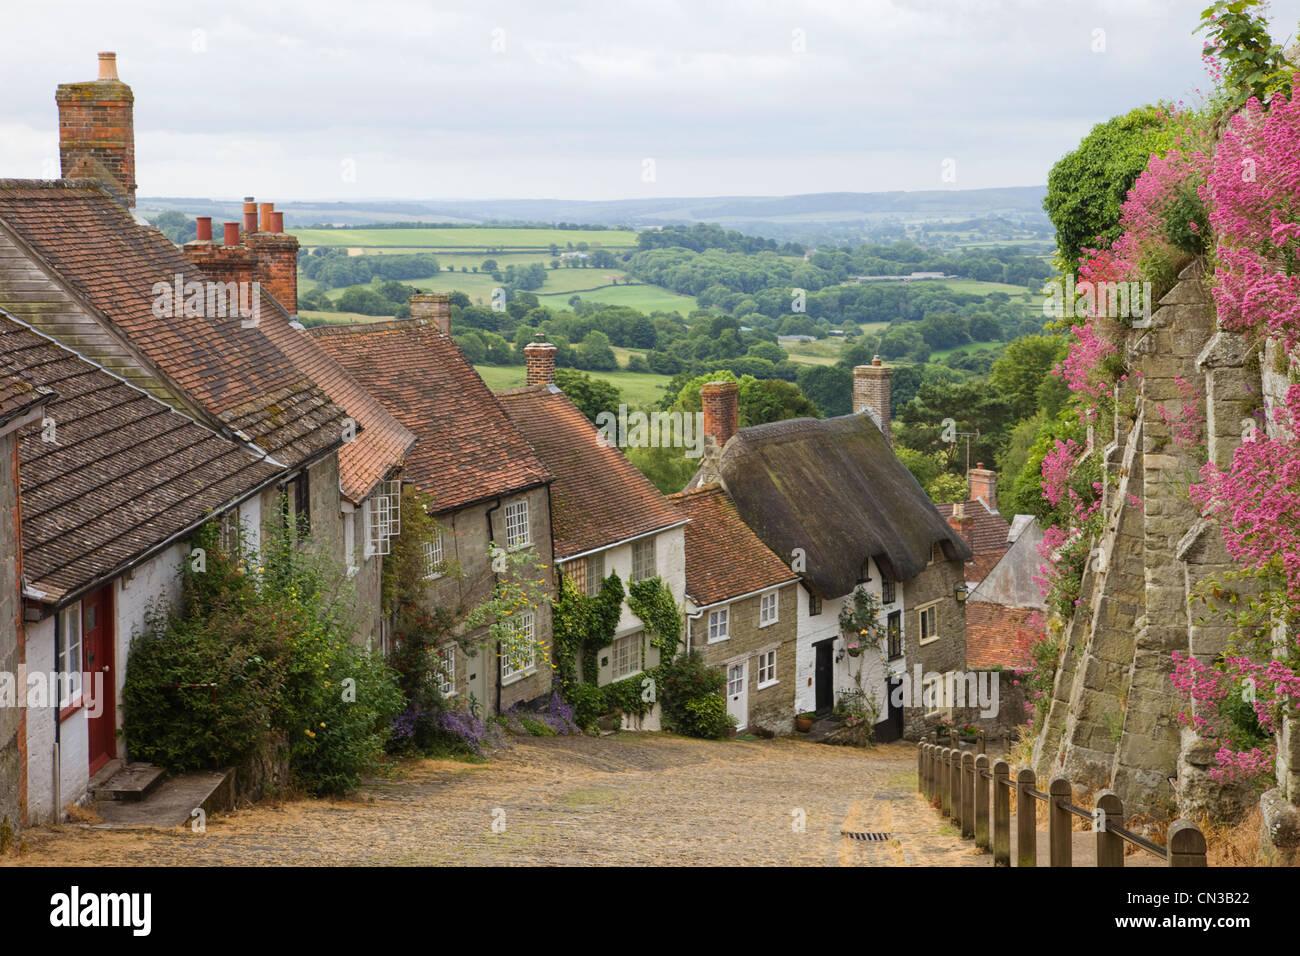 England, Dorset, Shaftesbury, Gold Hill - Stock Image